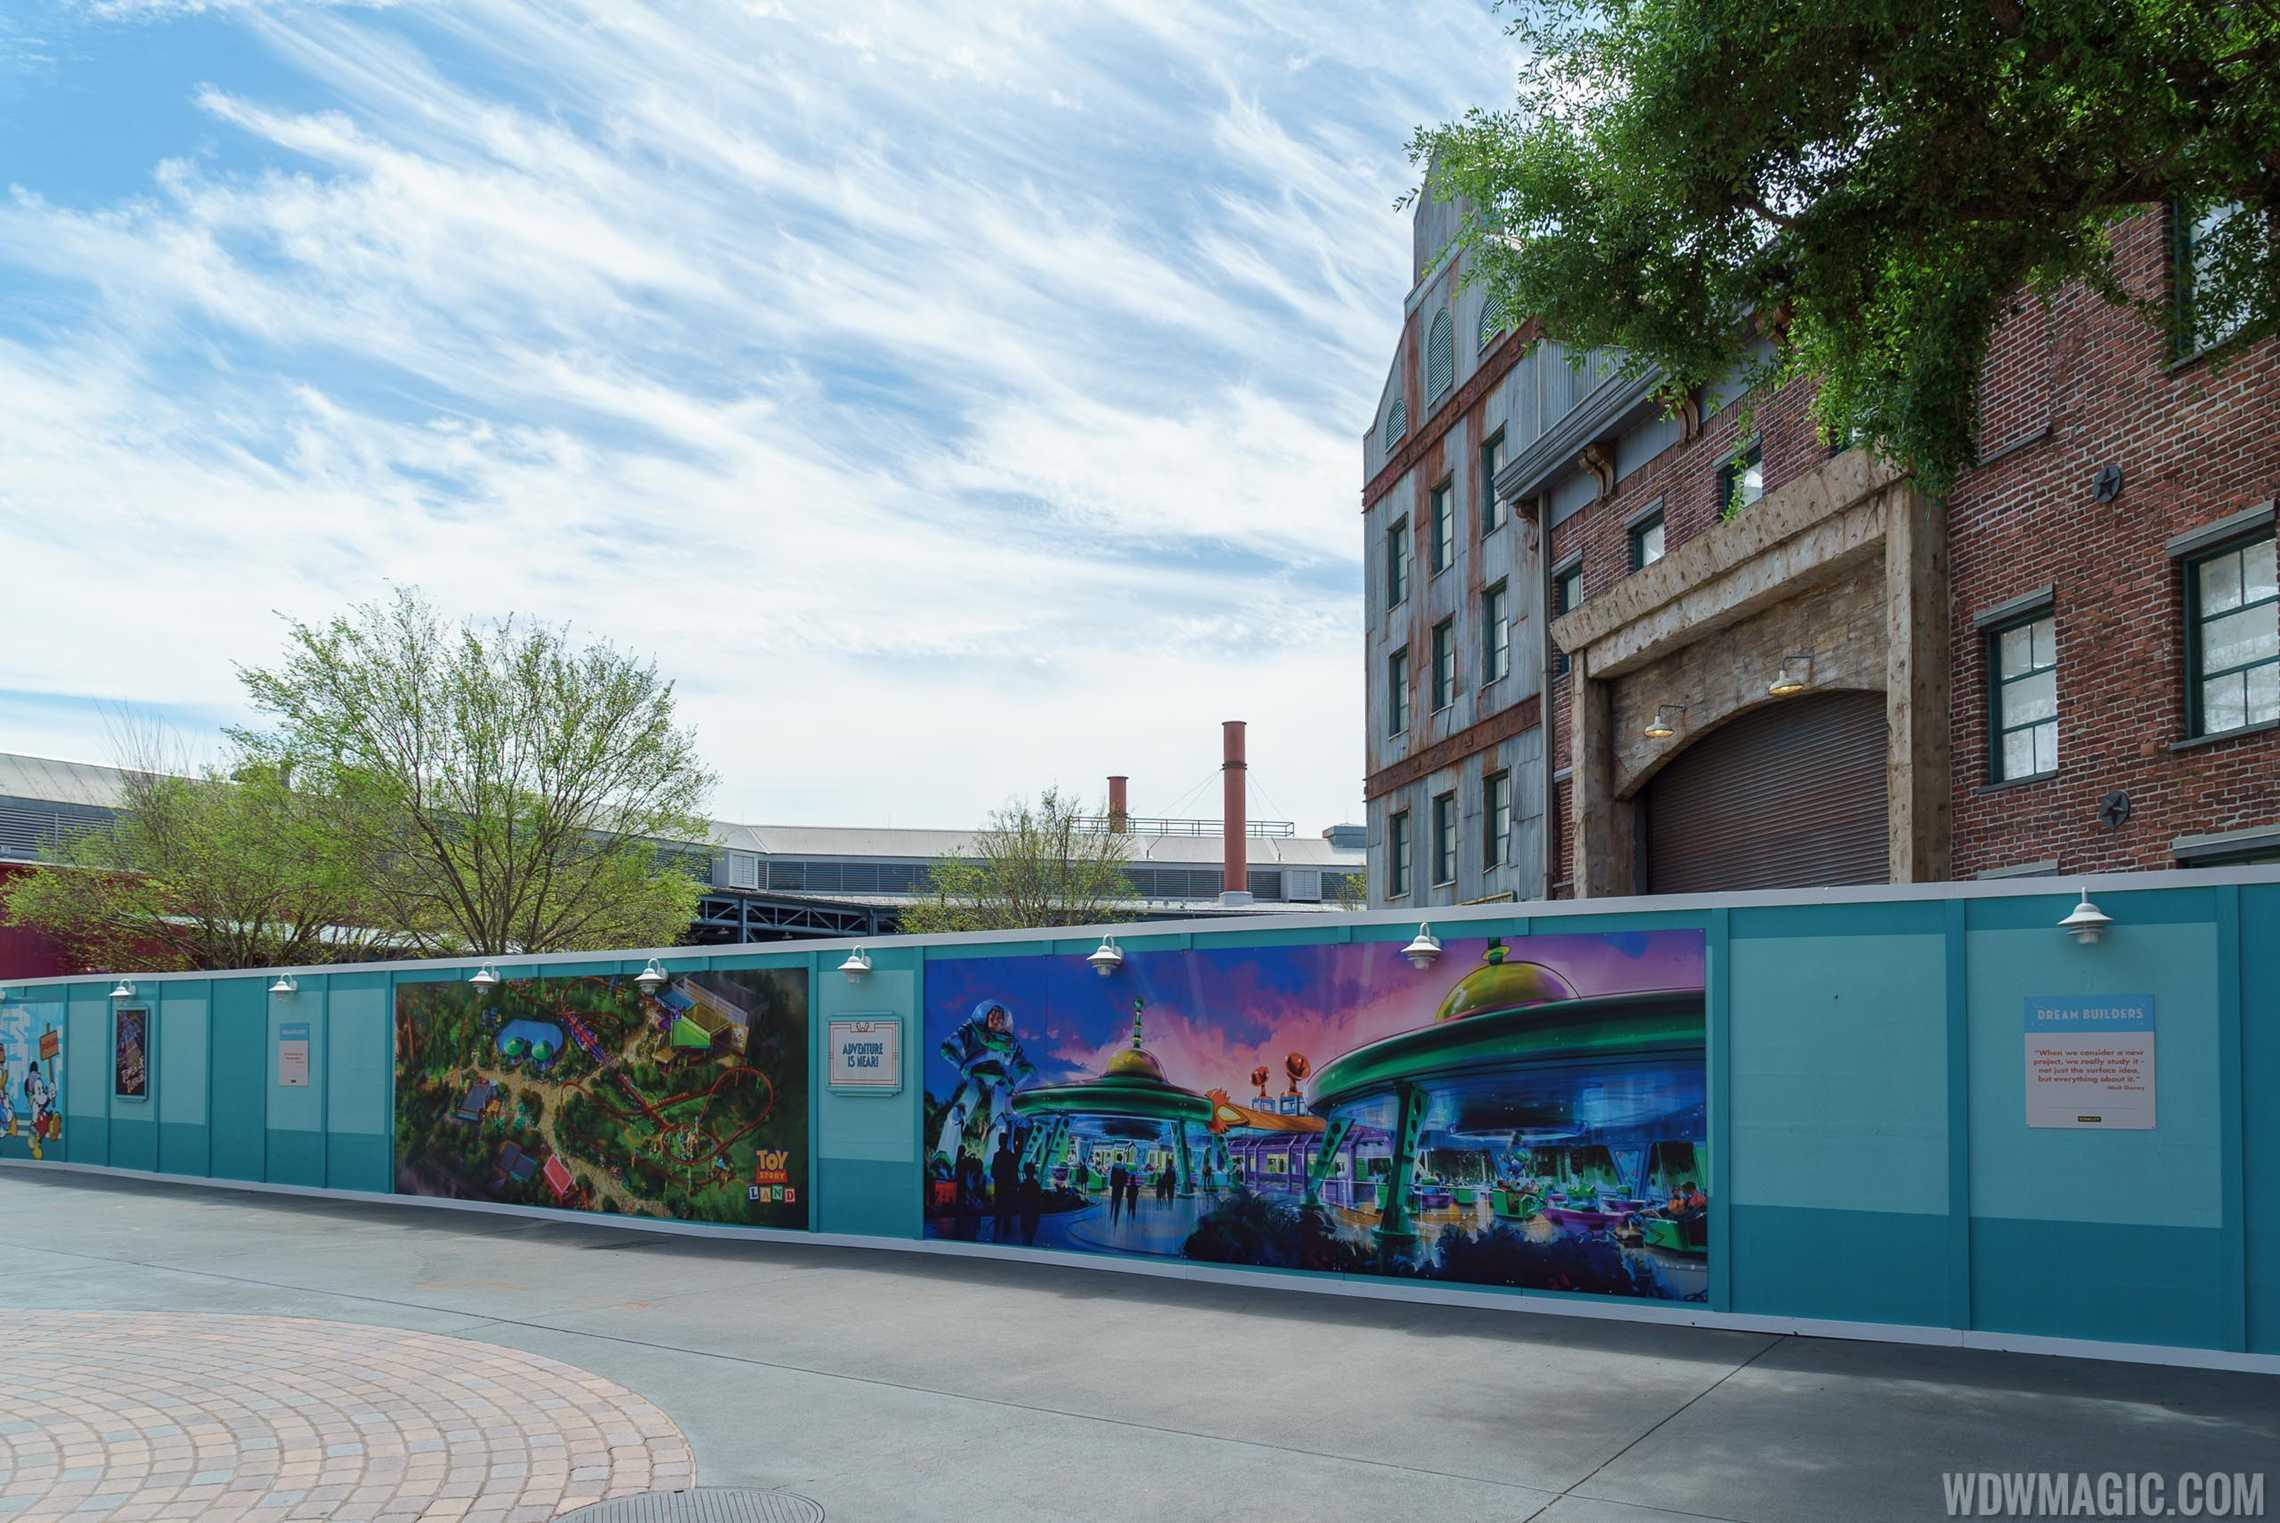 Walls near Pixar Place